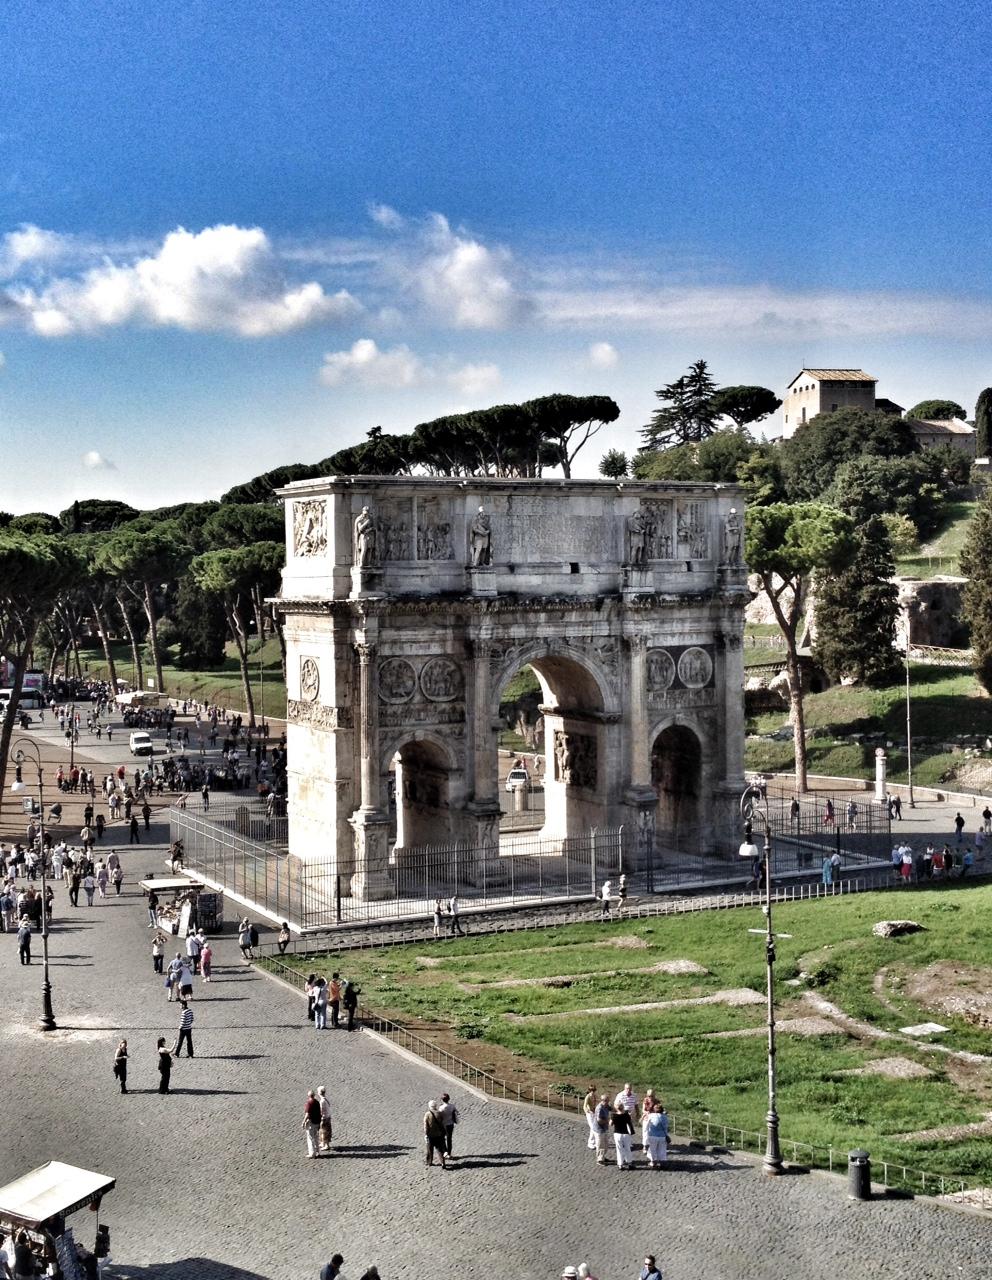 Rome, Italy, European travel, wanderlust, Arch of Constantine, Mediterranean Cruise Port